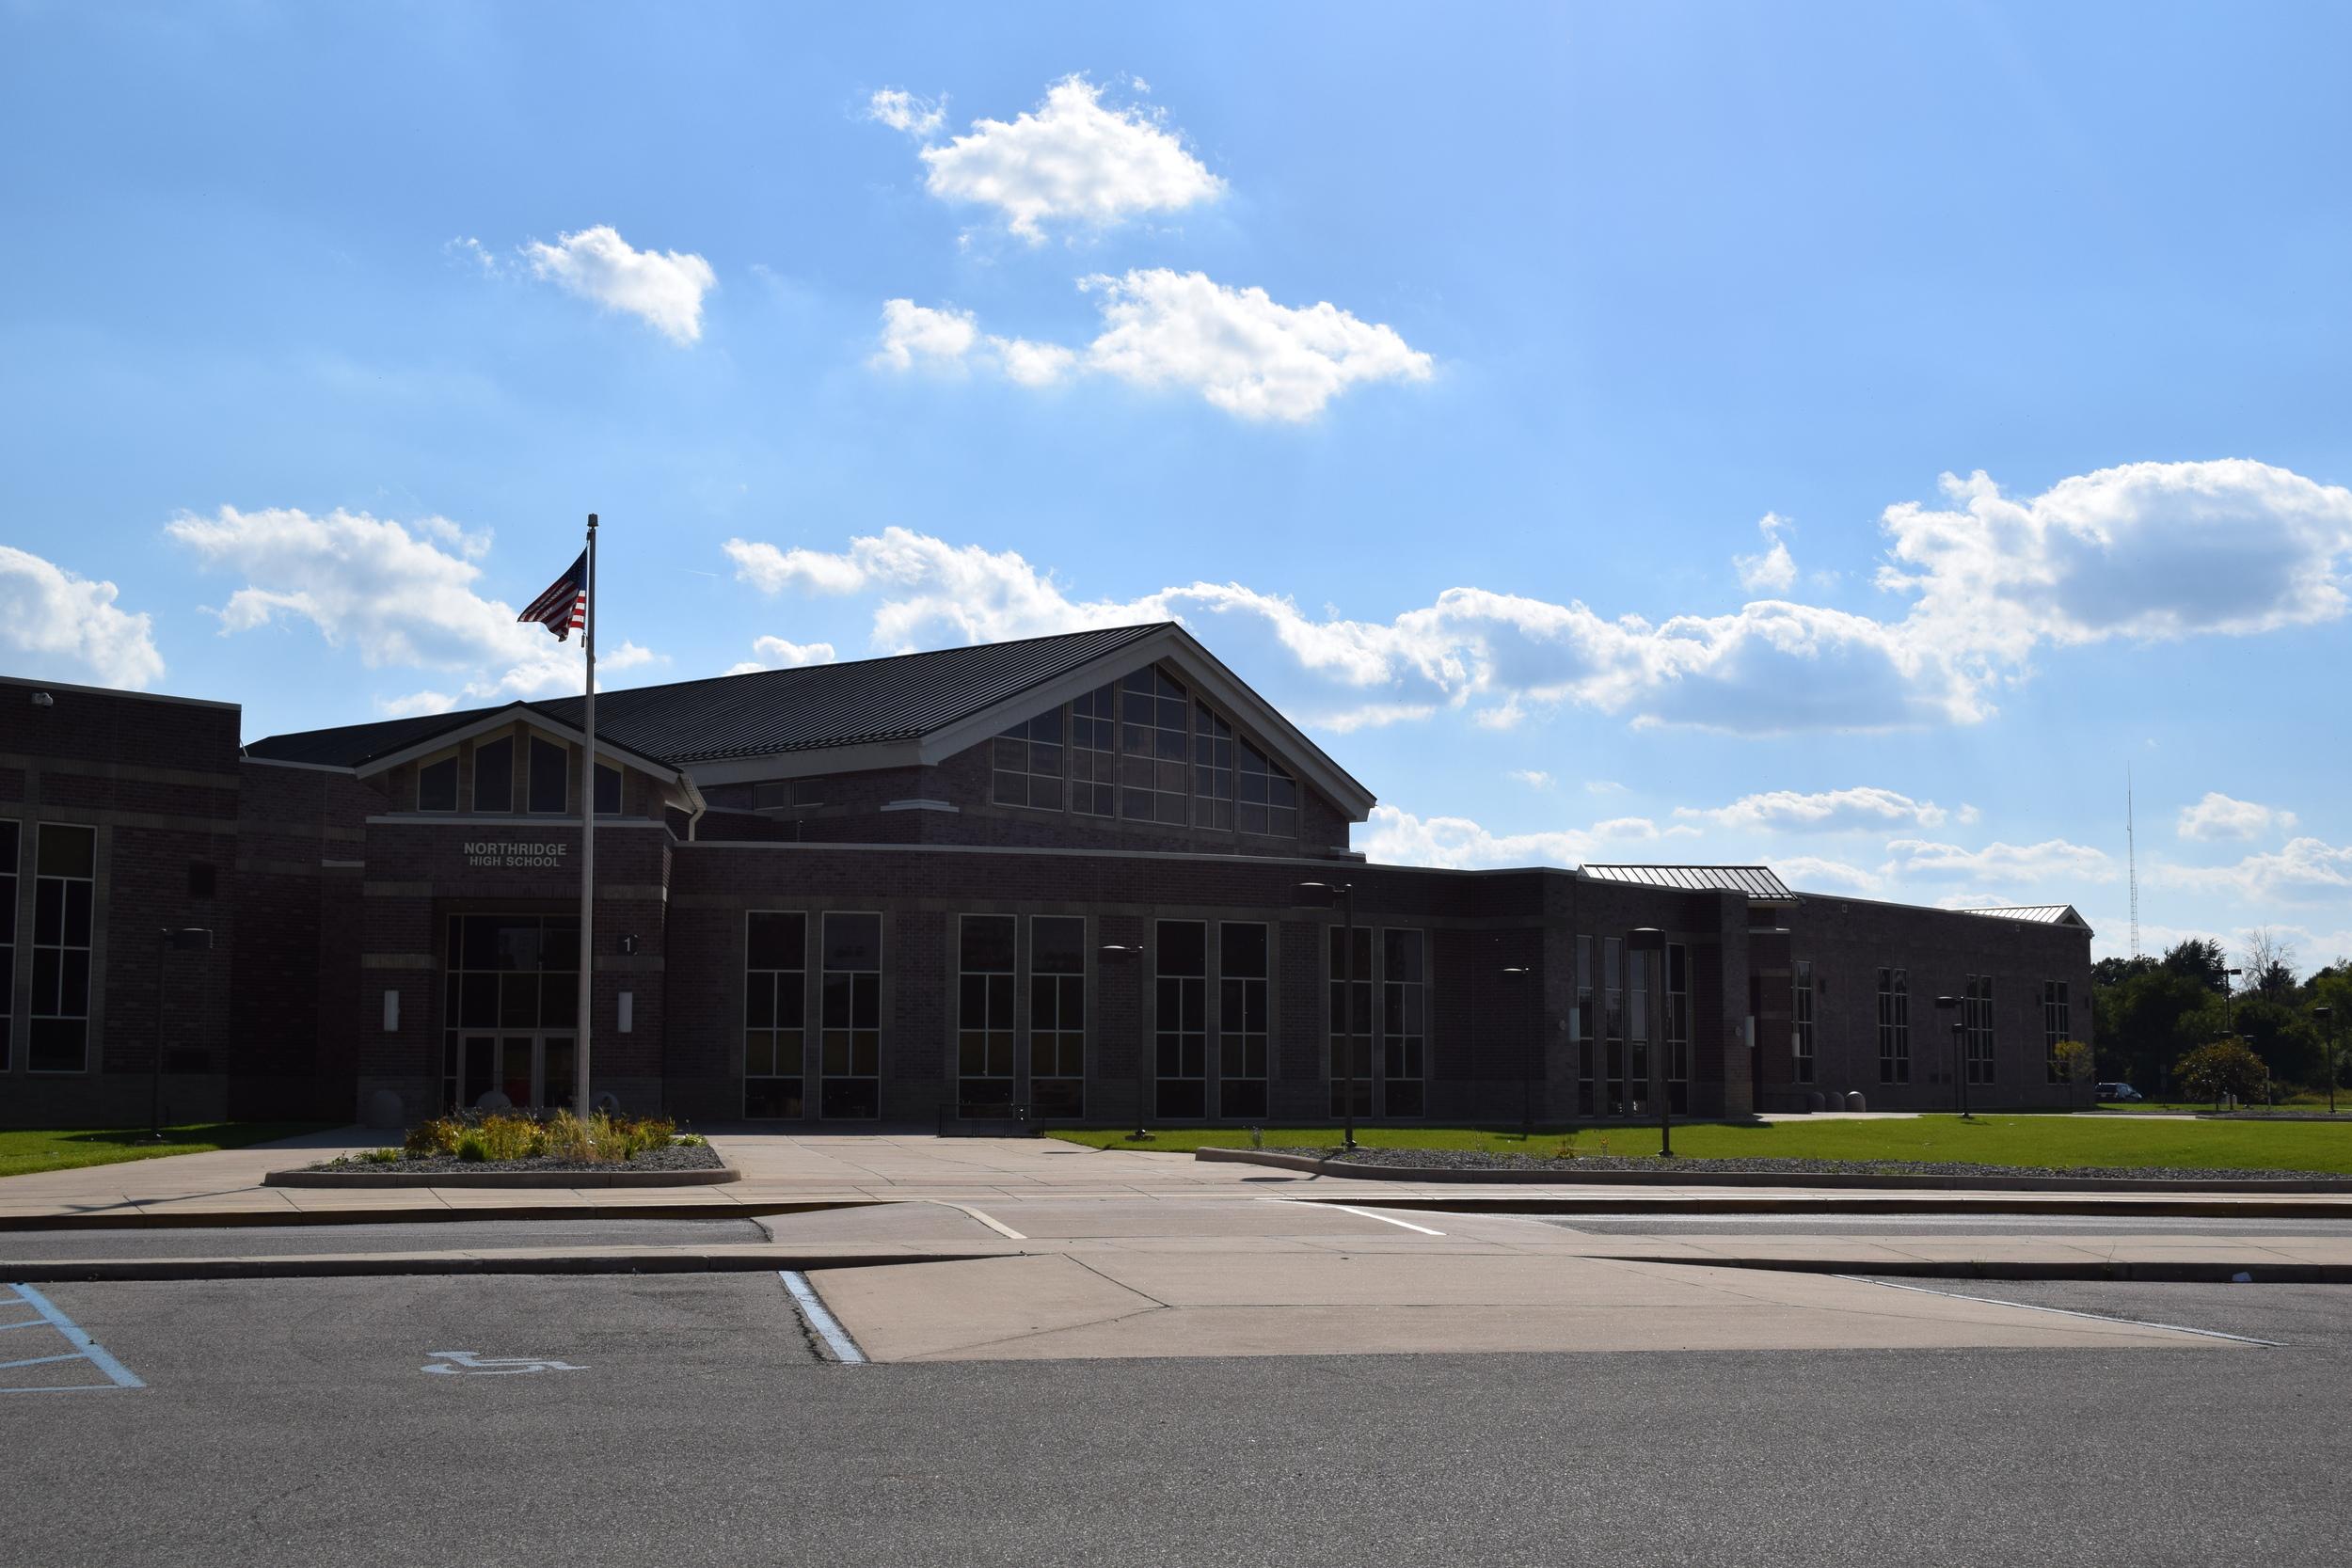 Northridge High School